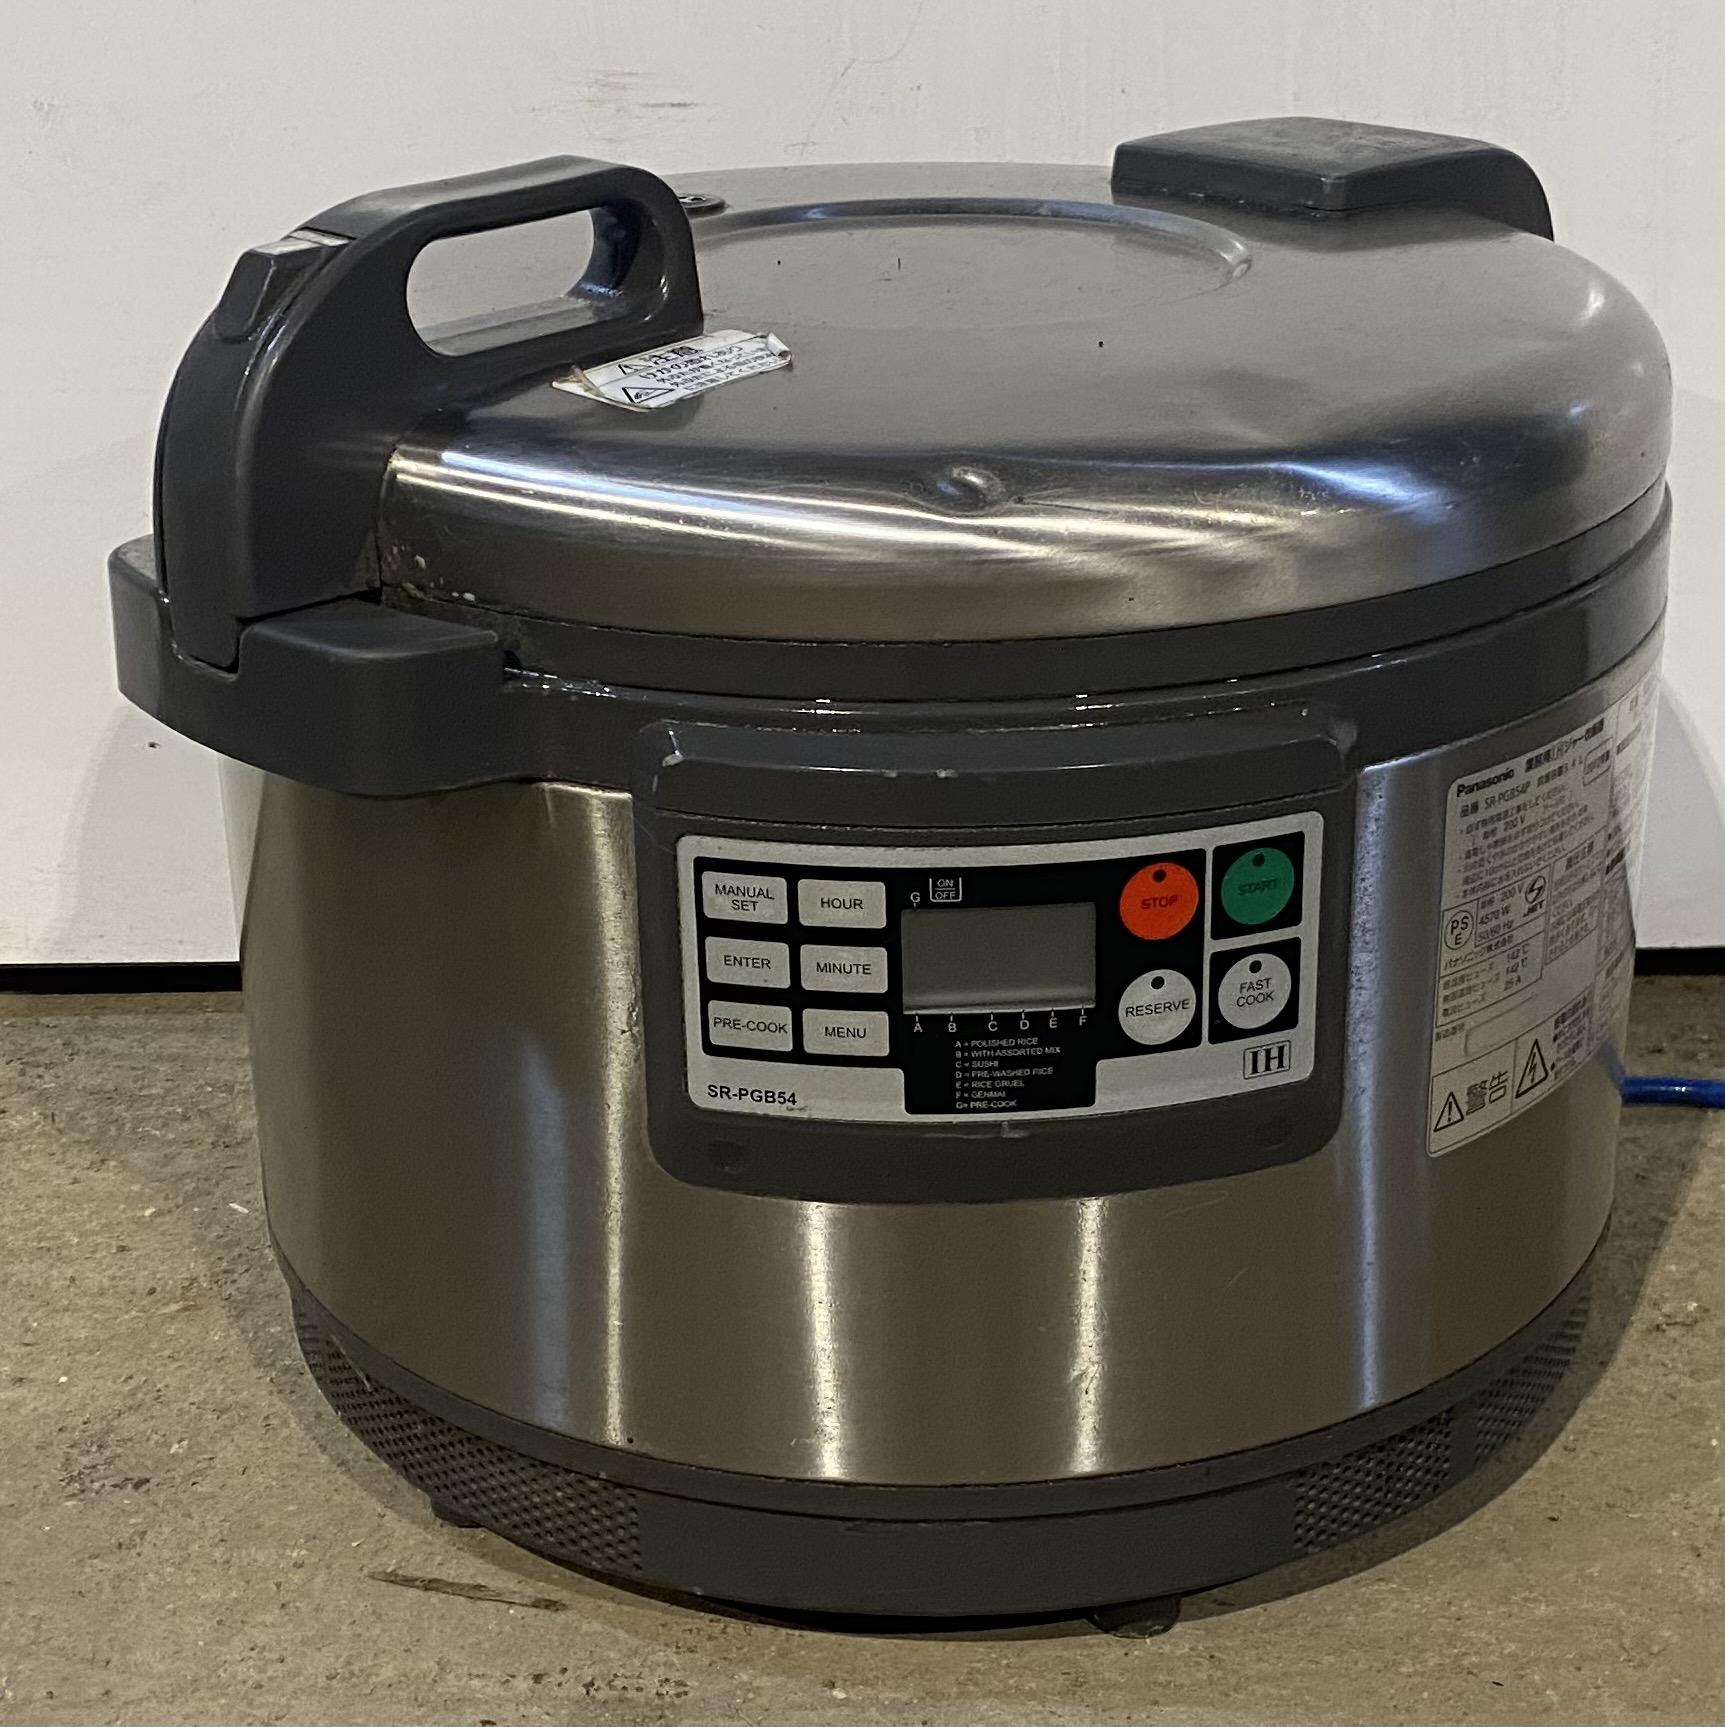 PANASONIC SRPGB54B Rice Cooker